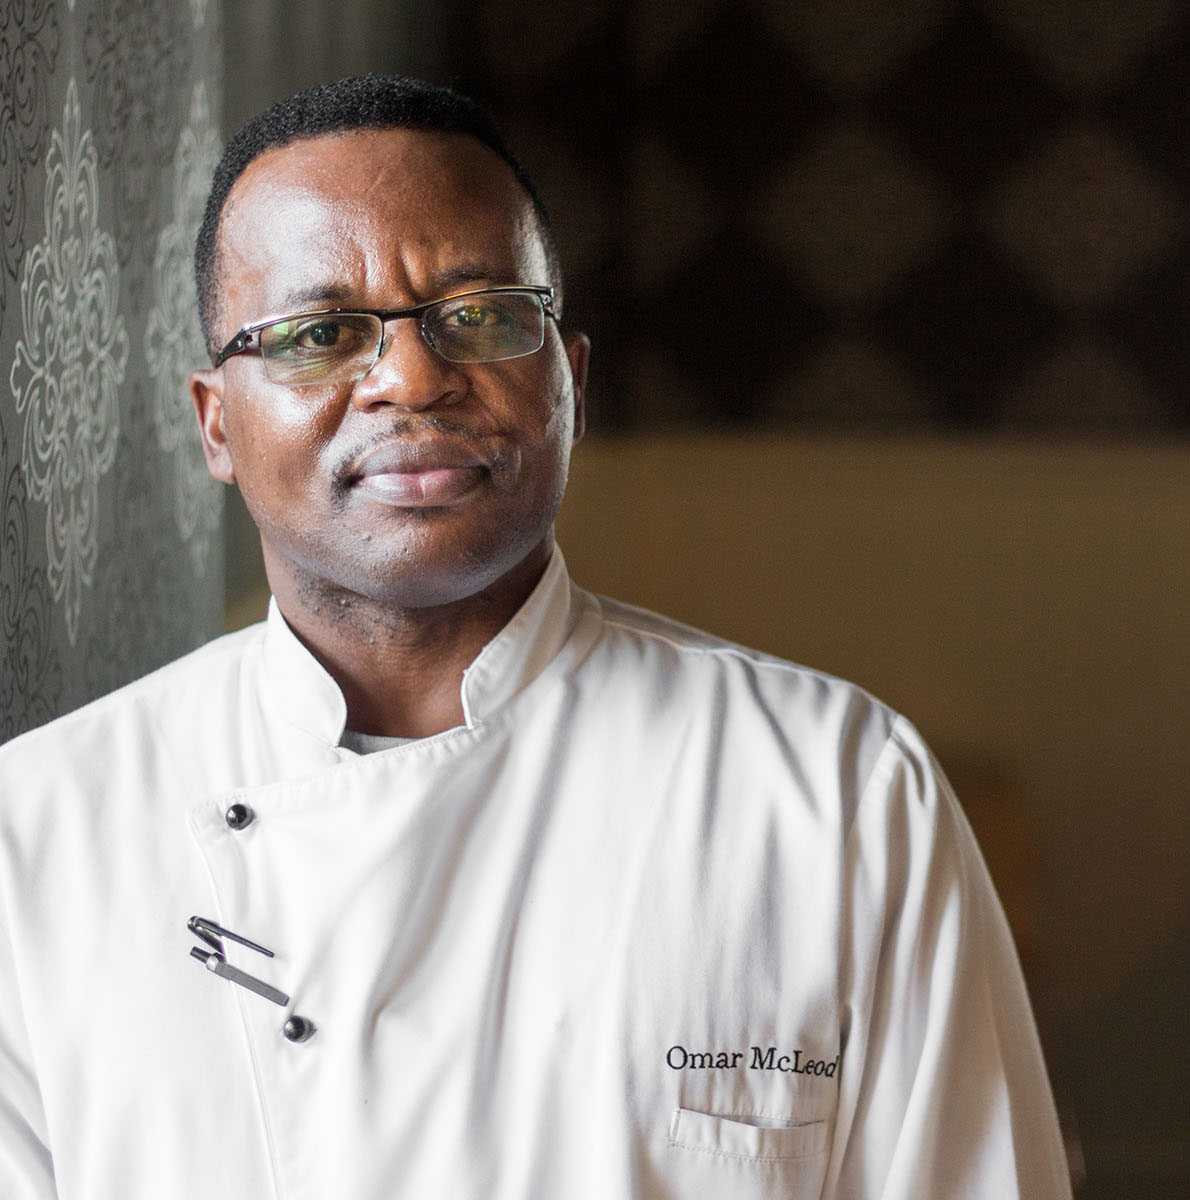 Chef Omar McLeod